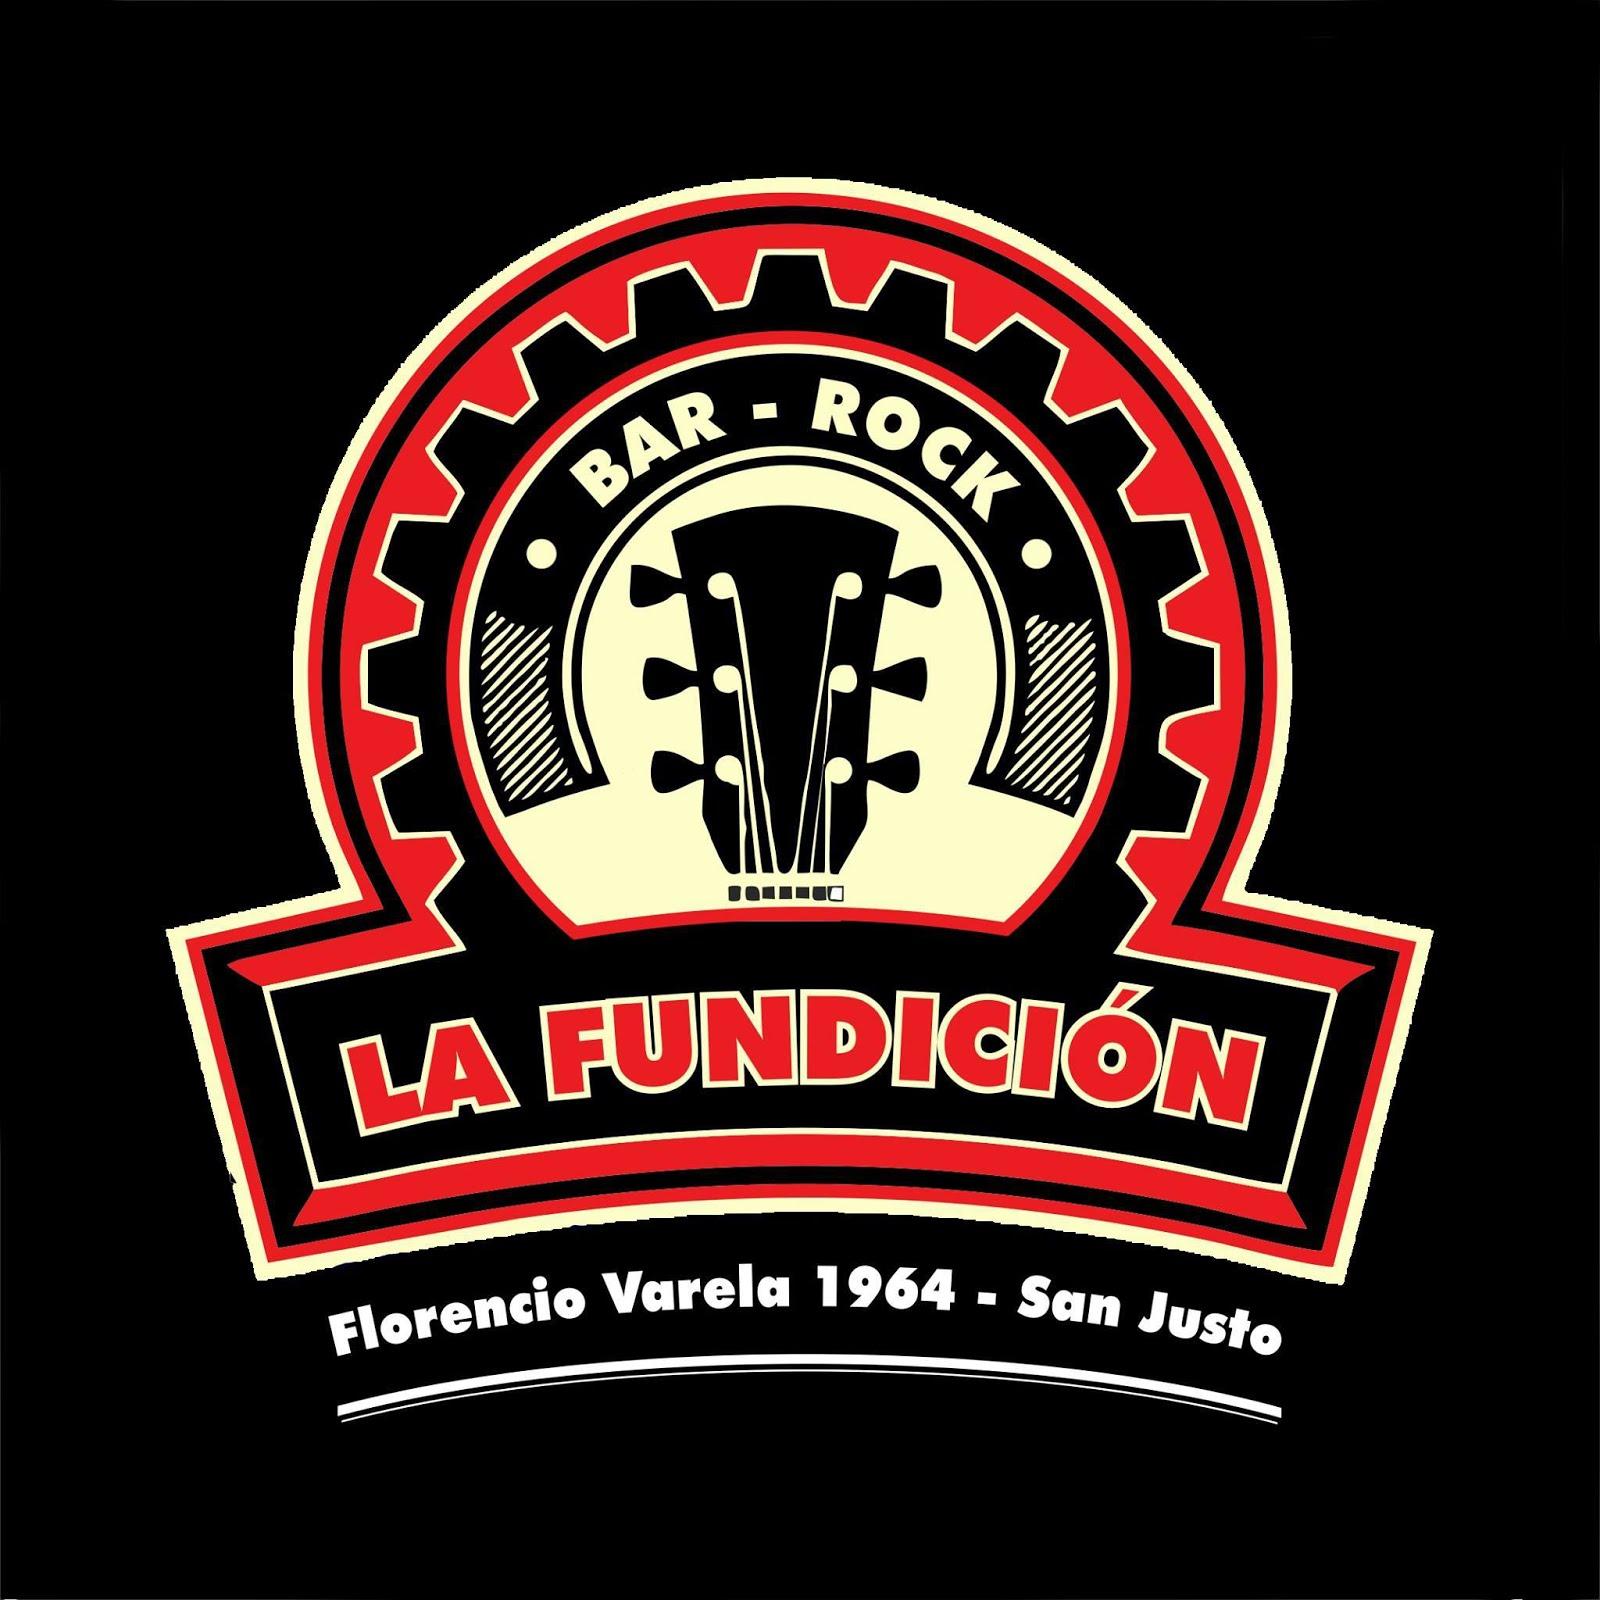 La Fundicion Bar